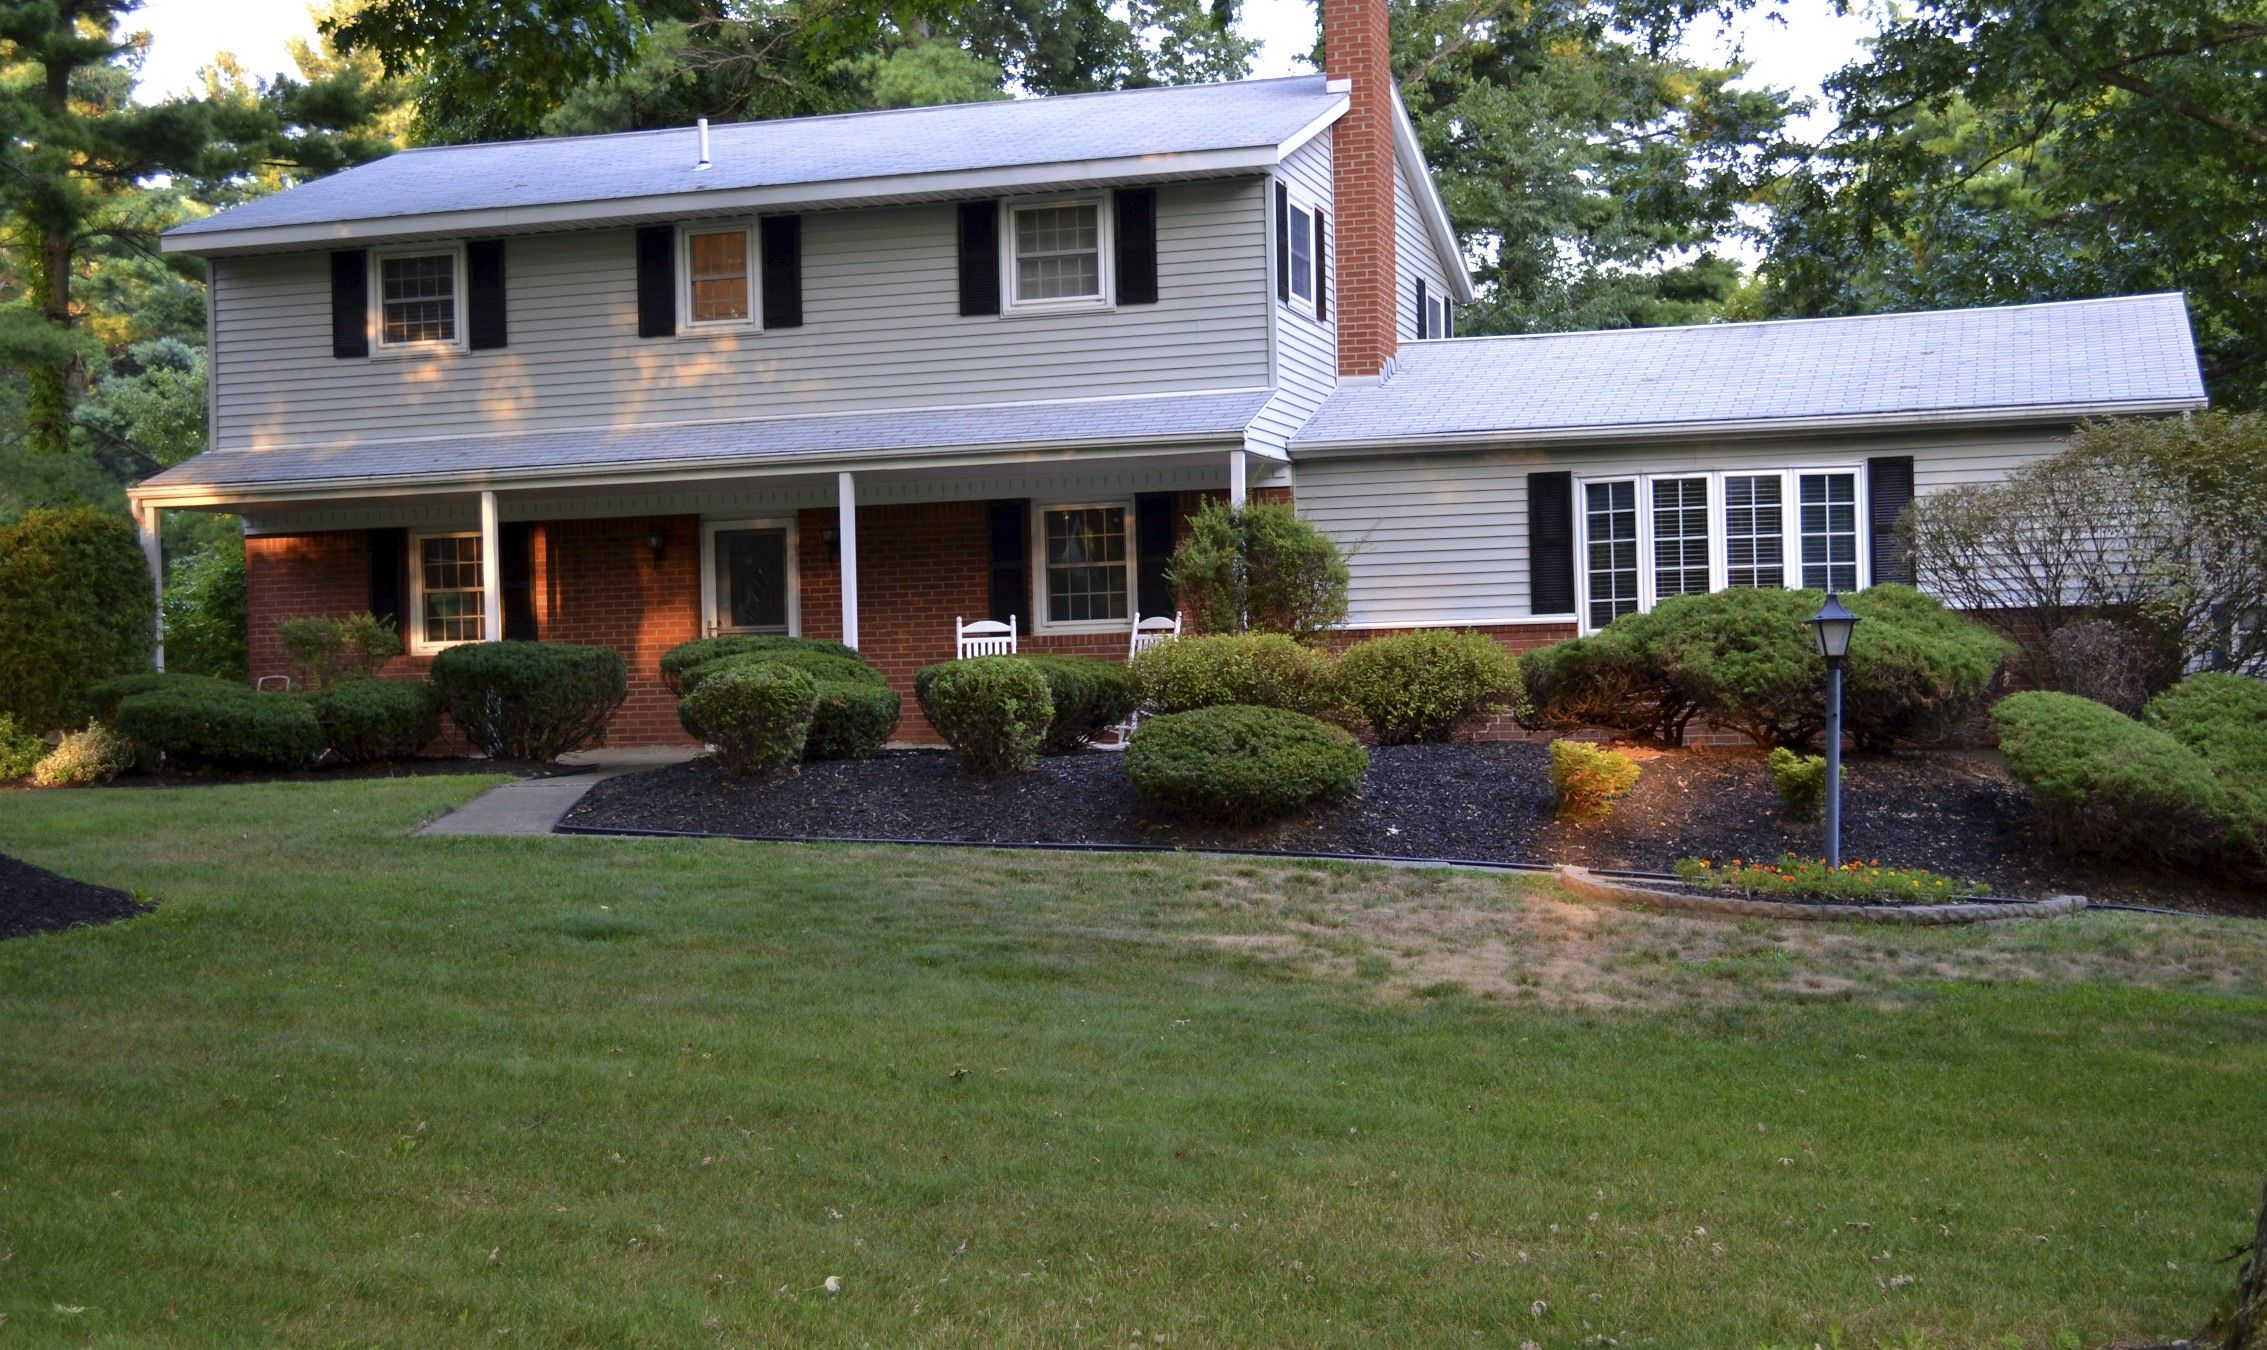 House Paint Of Half Brick Home